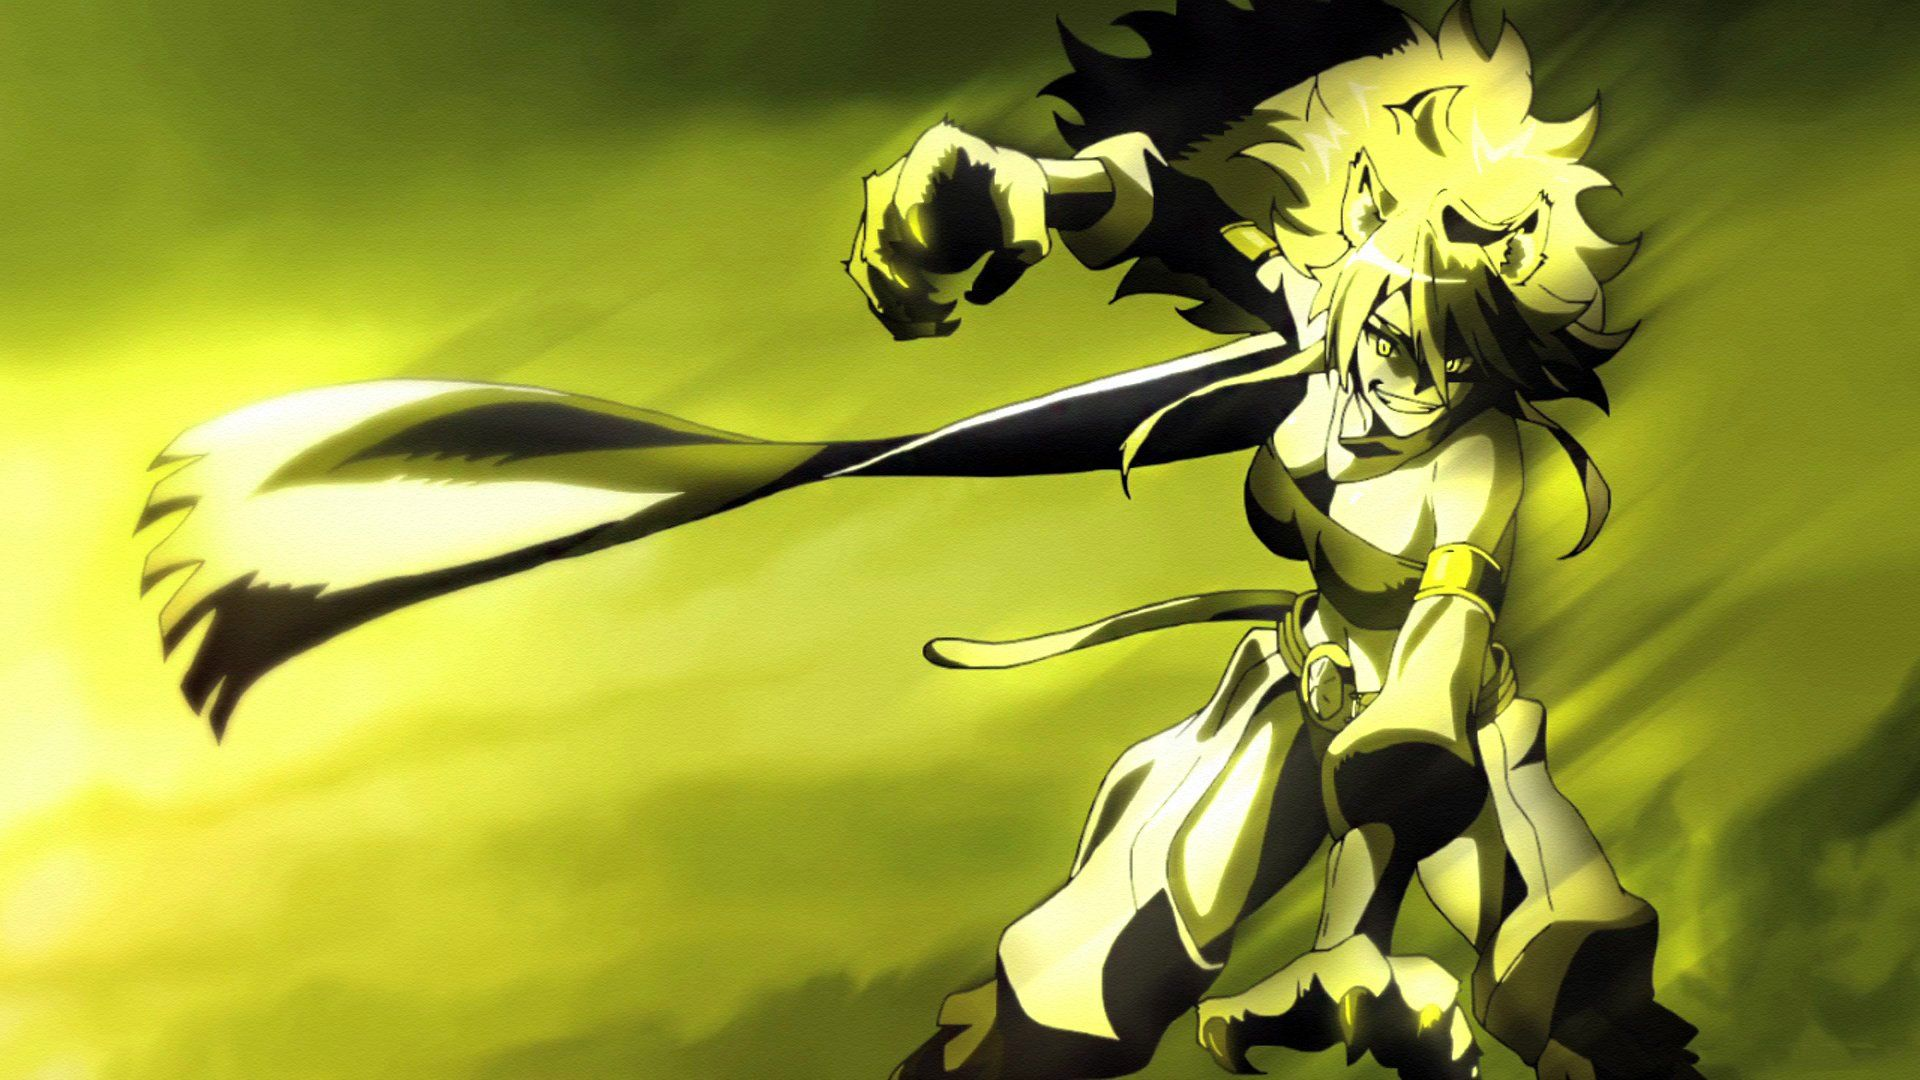 Anime Akame Ga Kill Leone Akame Ga Kill Wallpaper Fondo De